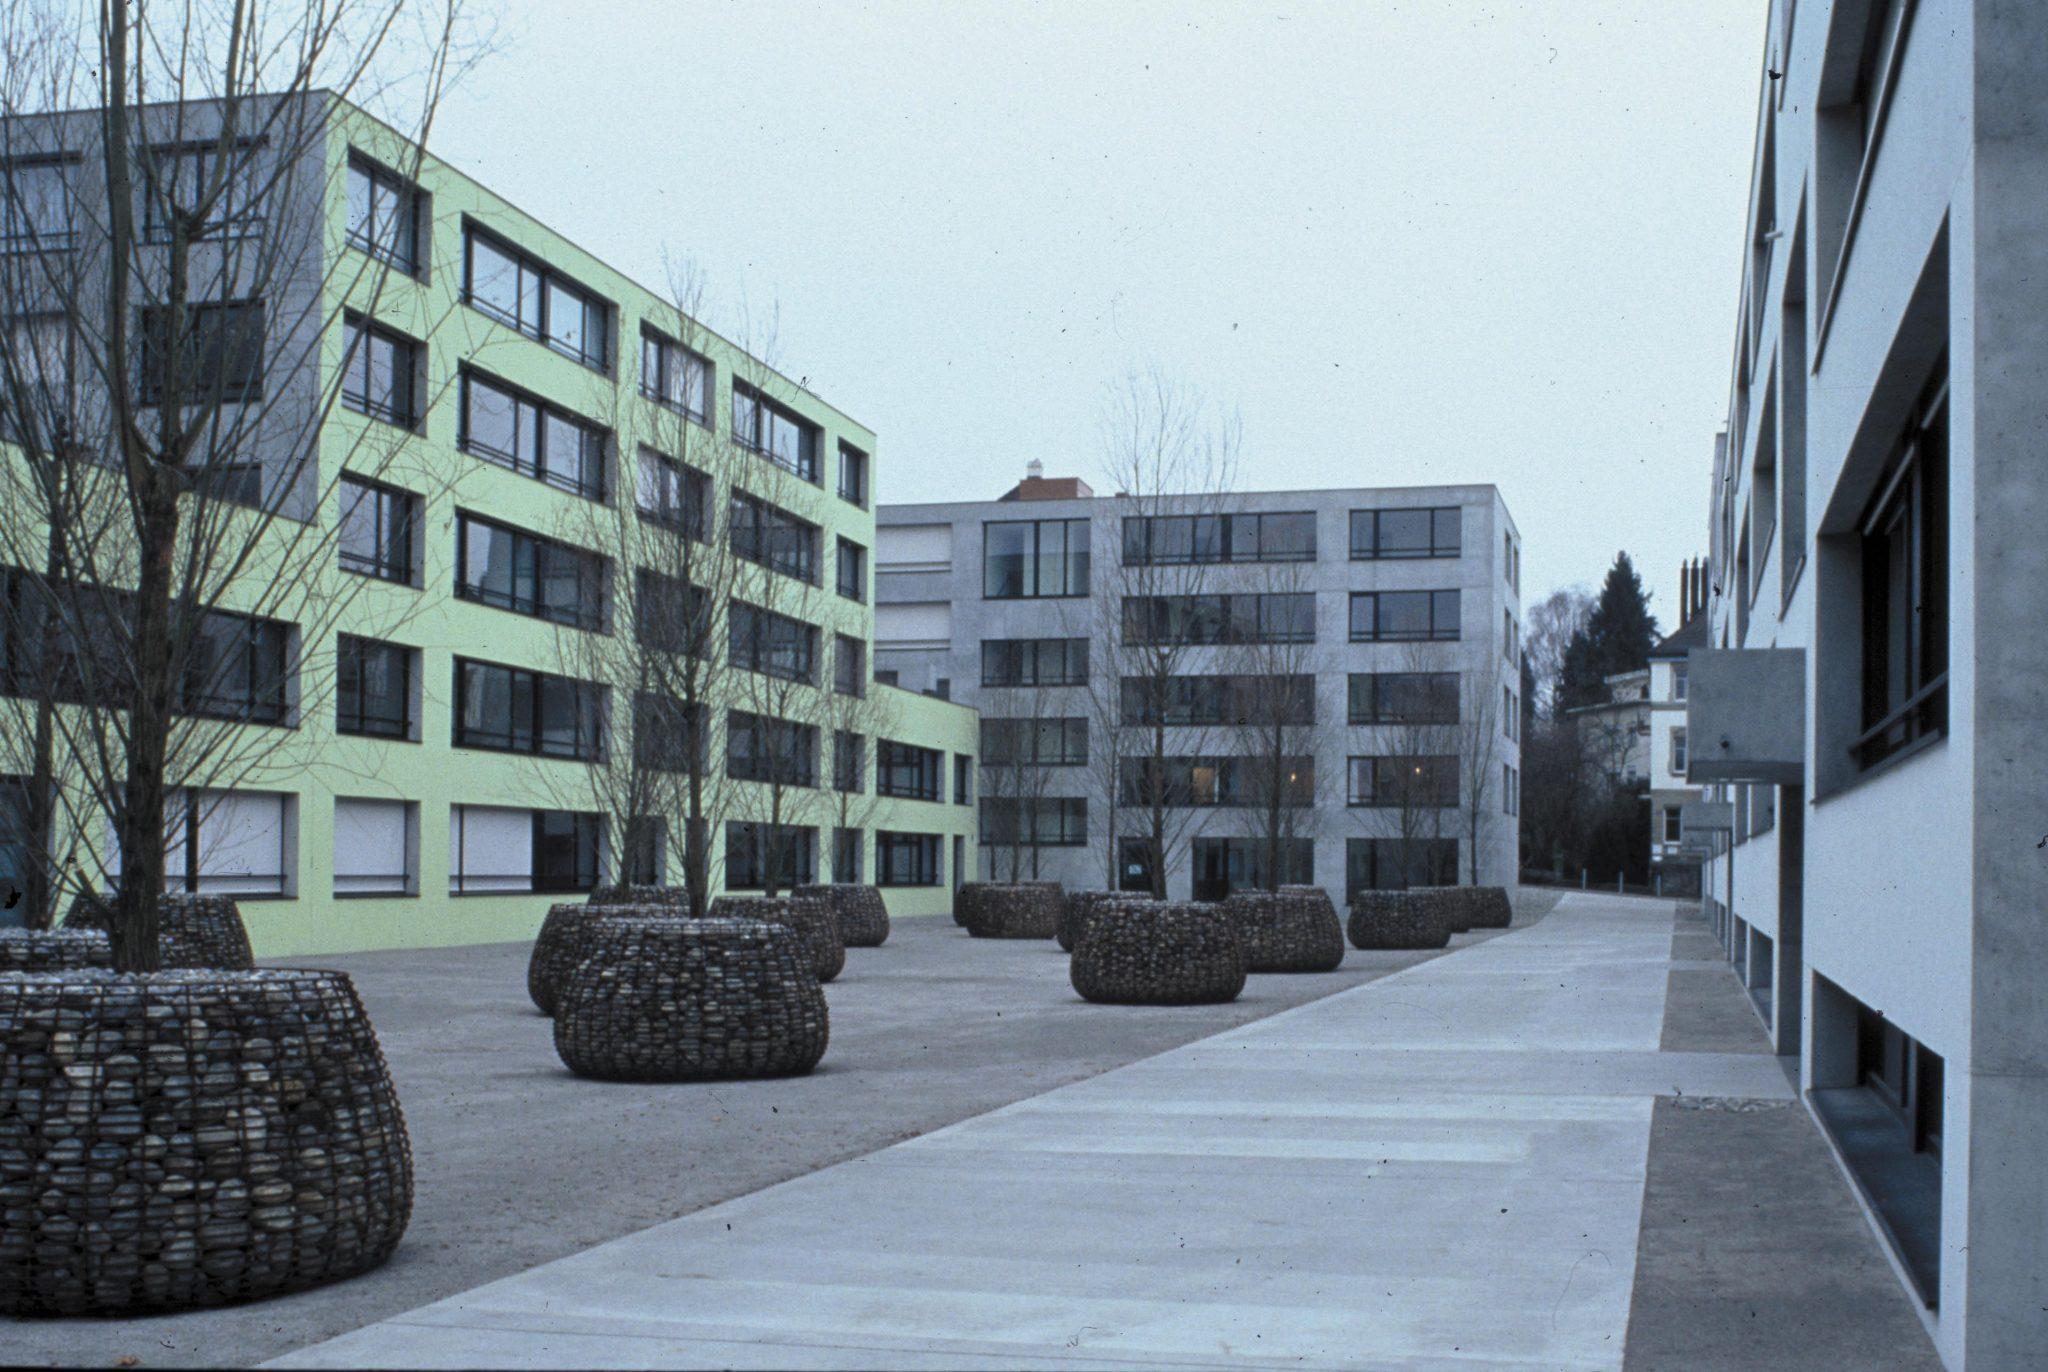 Pflegi-Areal, Carmen-/Sonnhaldenstrasse, Zürich